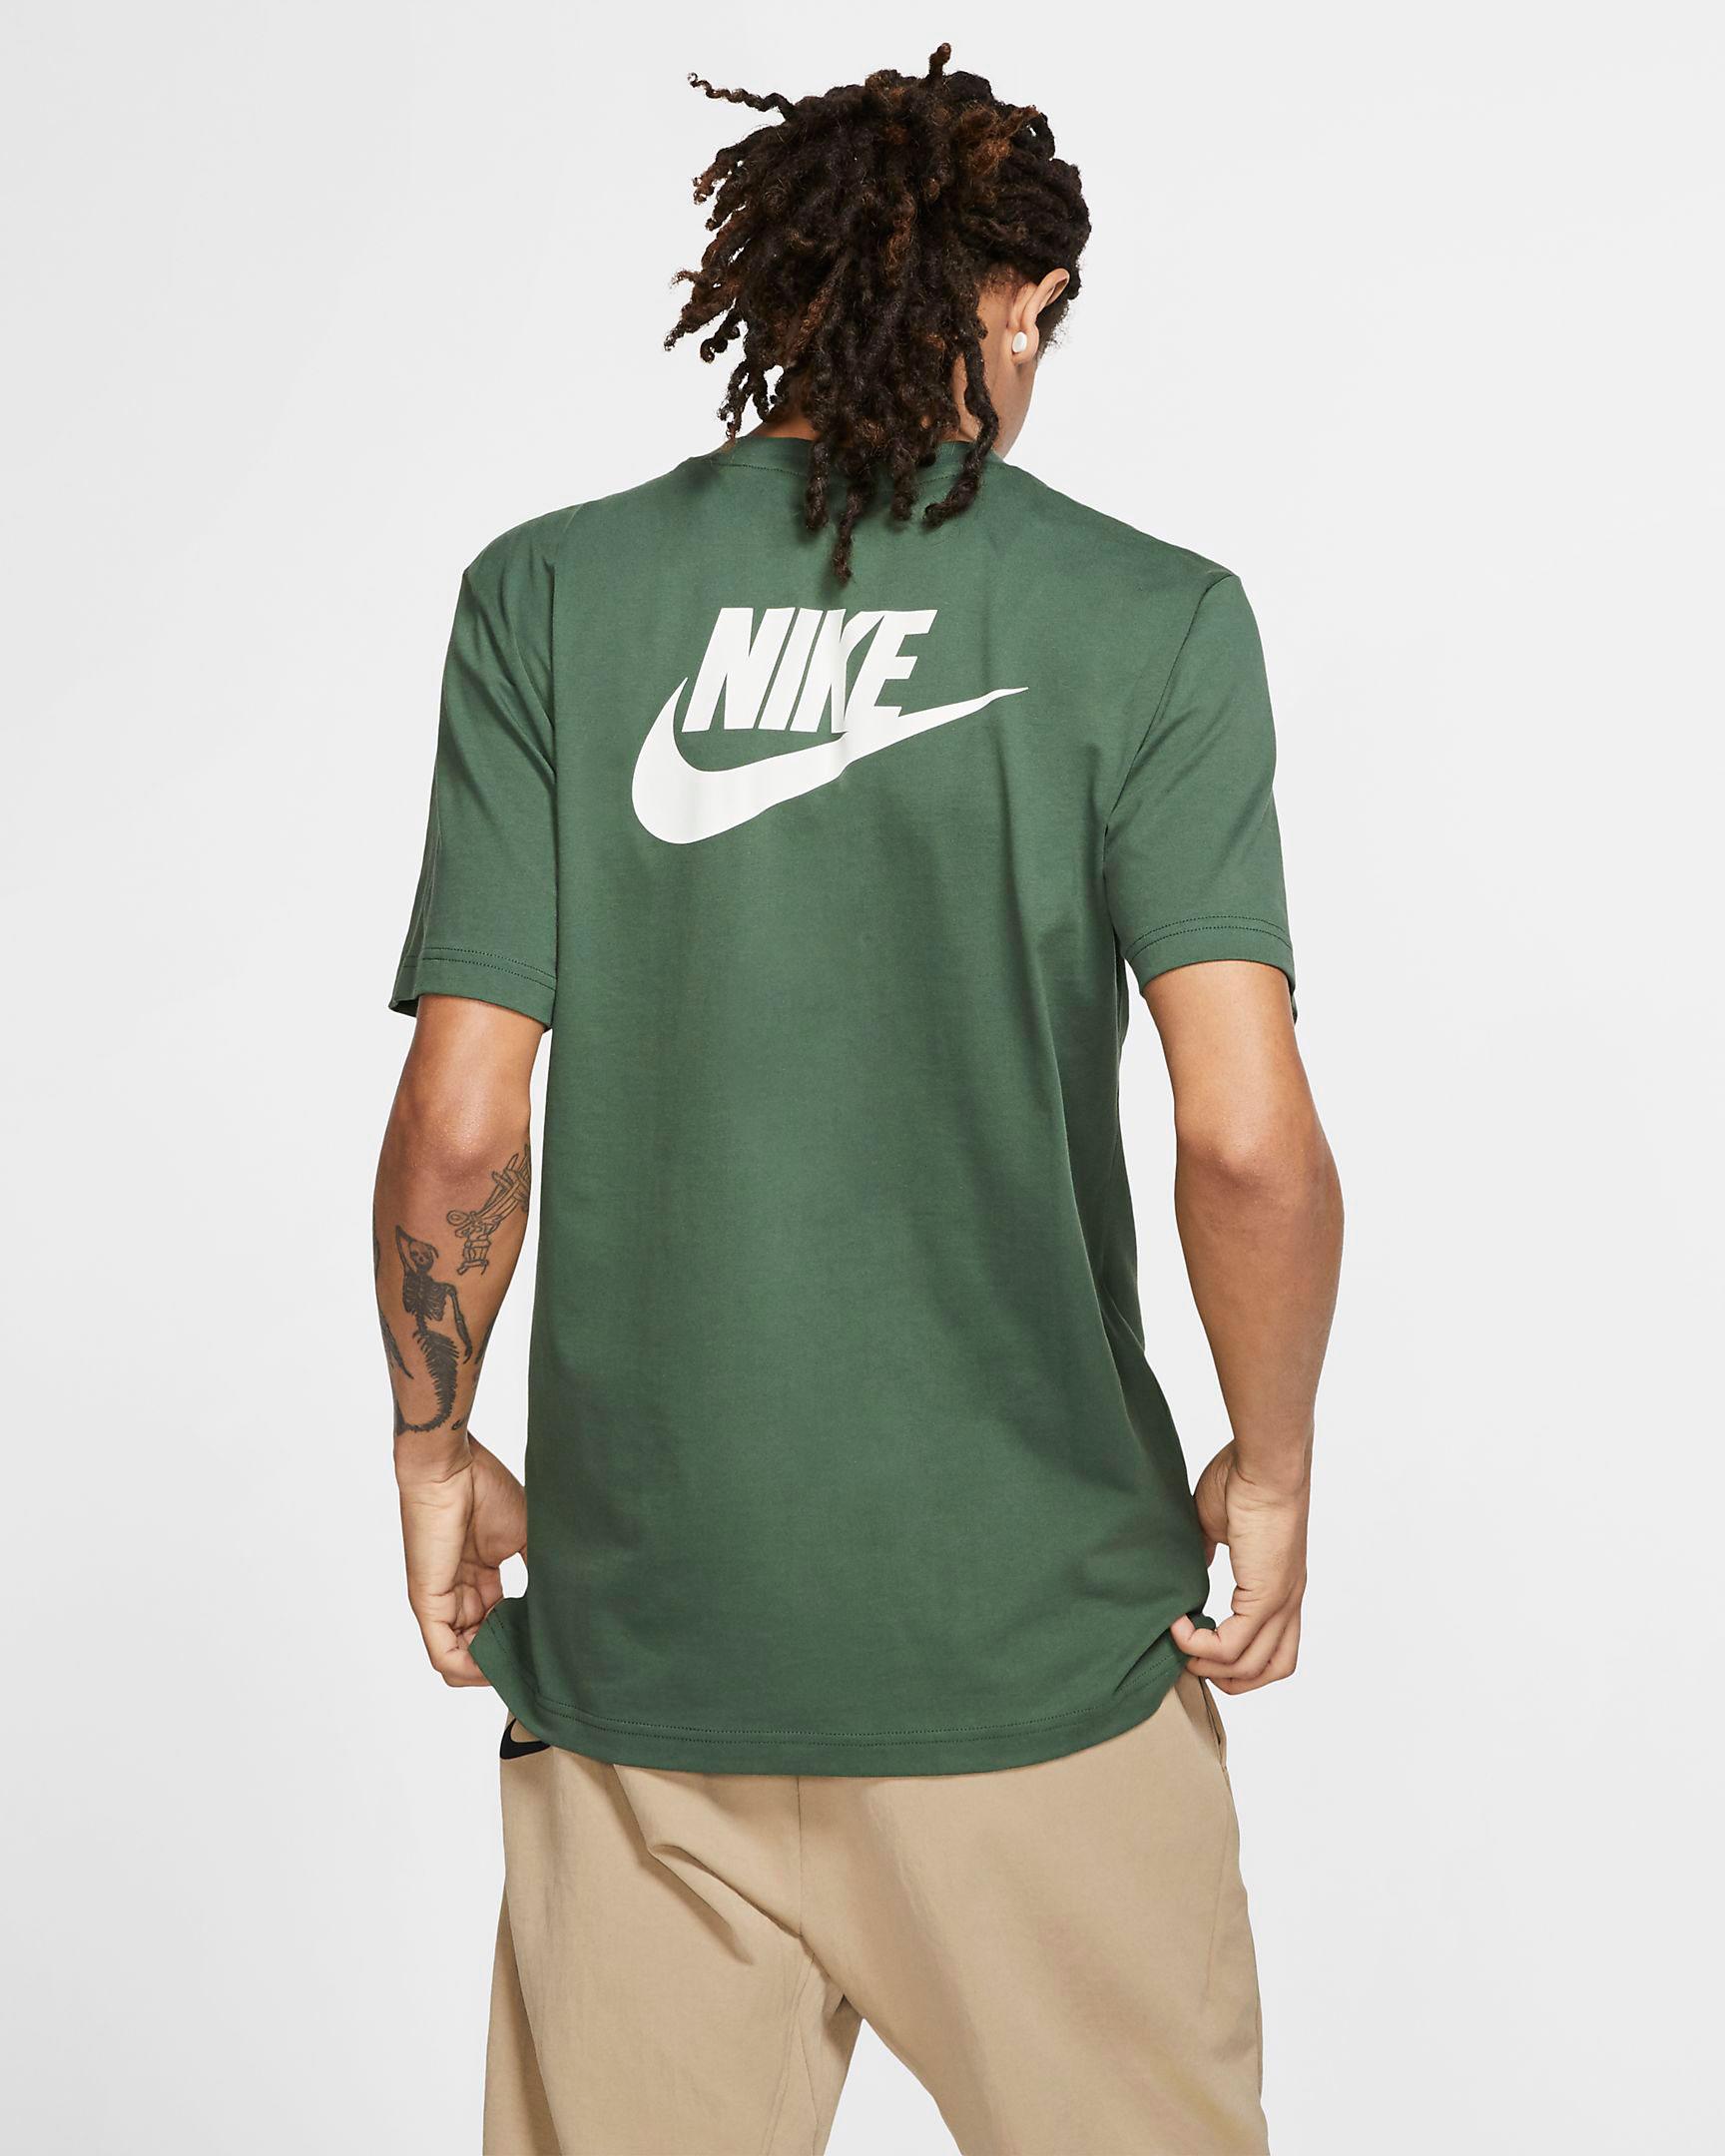 nike-stranger-things-hawkins-high-t-shirt-green-2